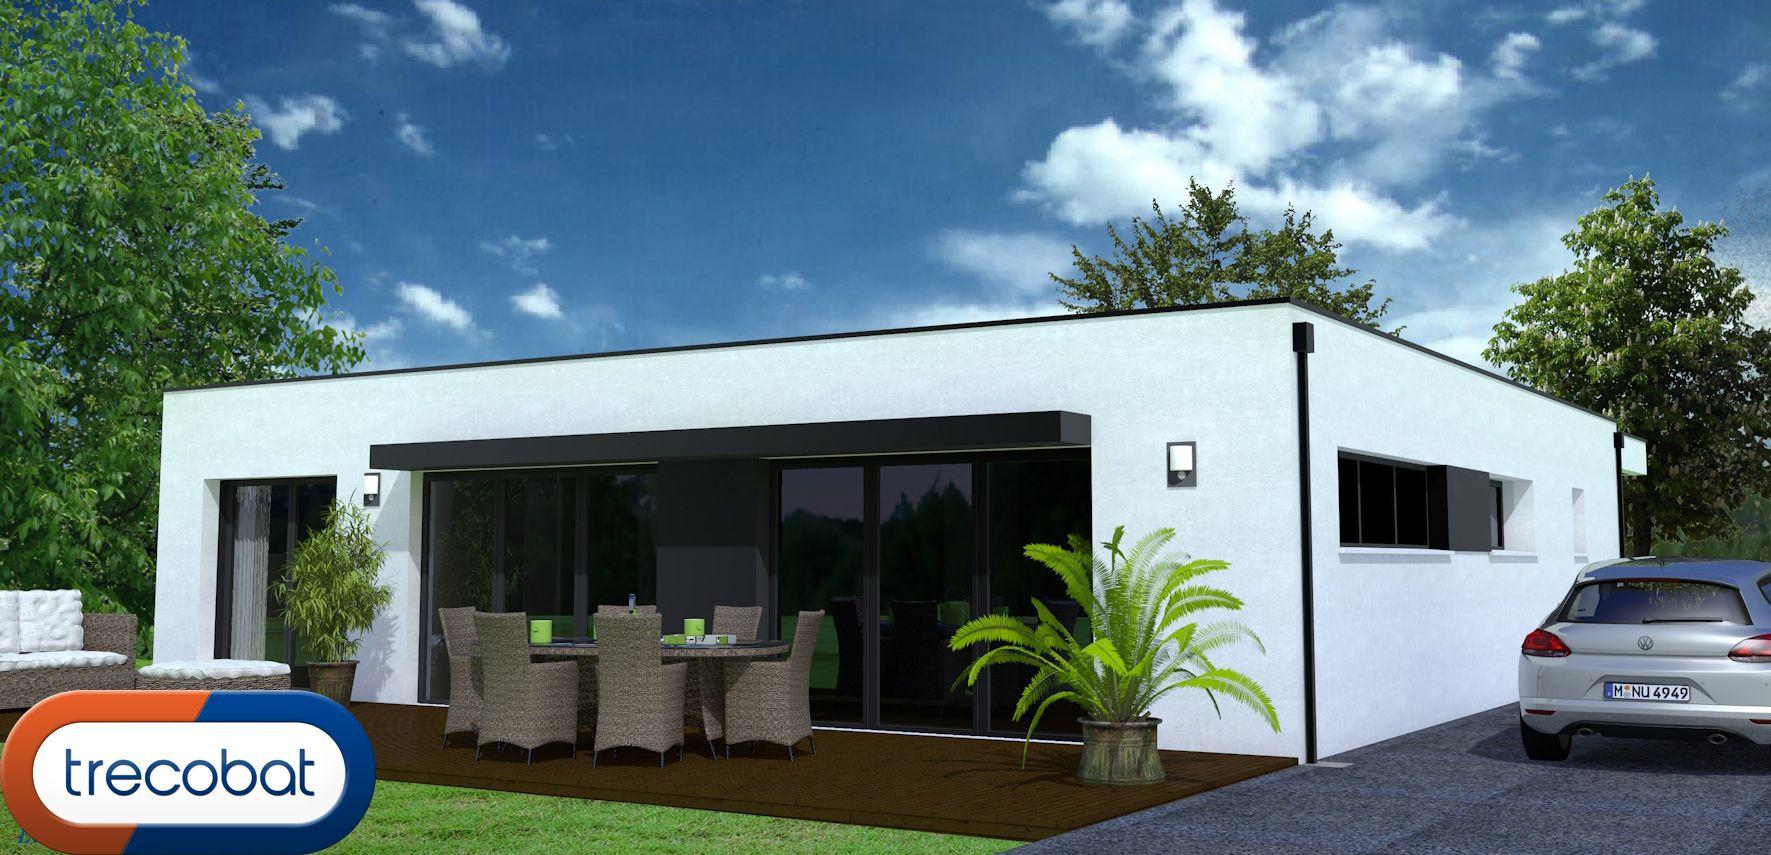 pin by maisons trecobat on avants projets maisons trecobat pinterest. Black Bedroom Furniture Sets. Home Design Ideas